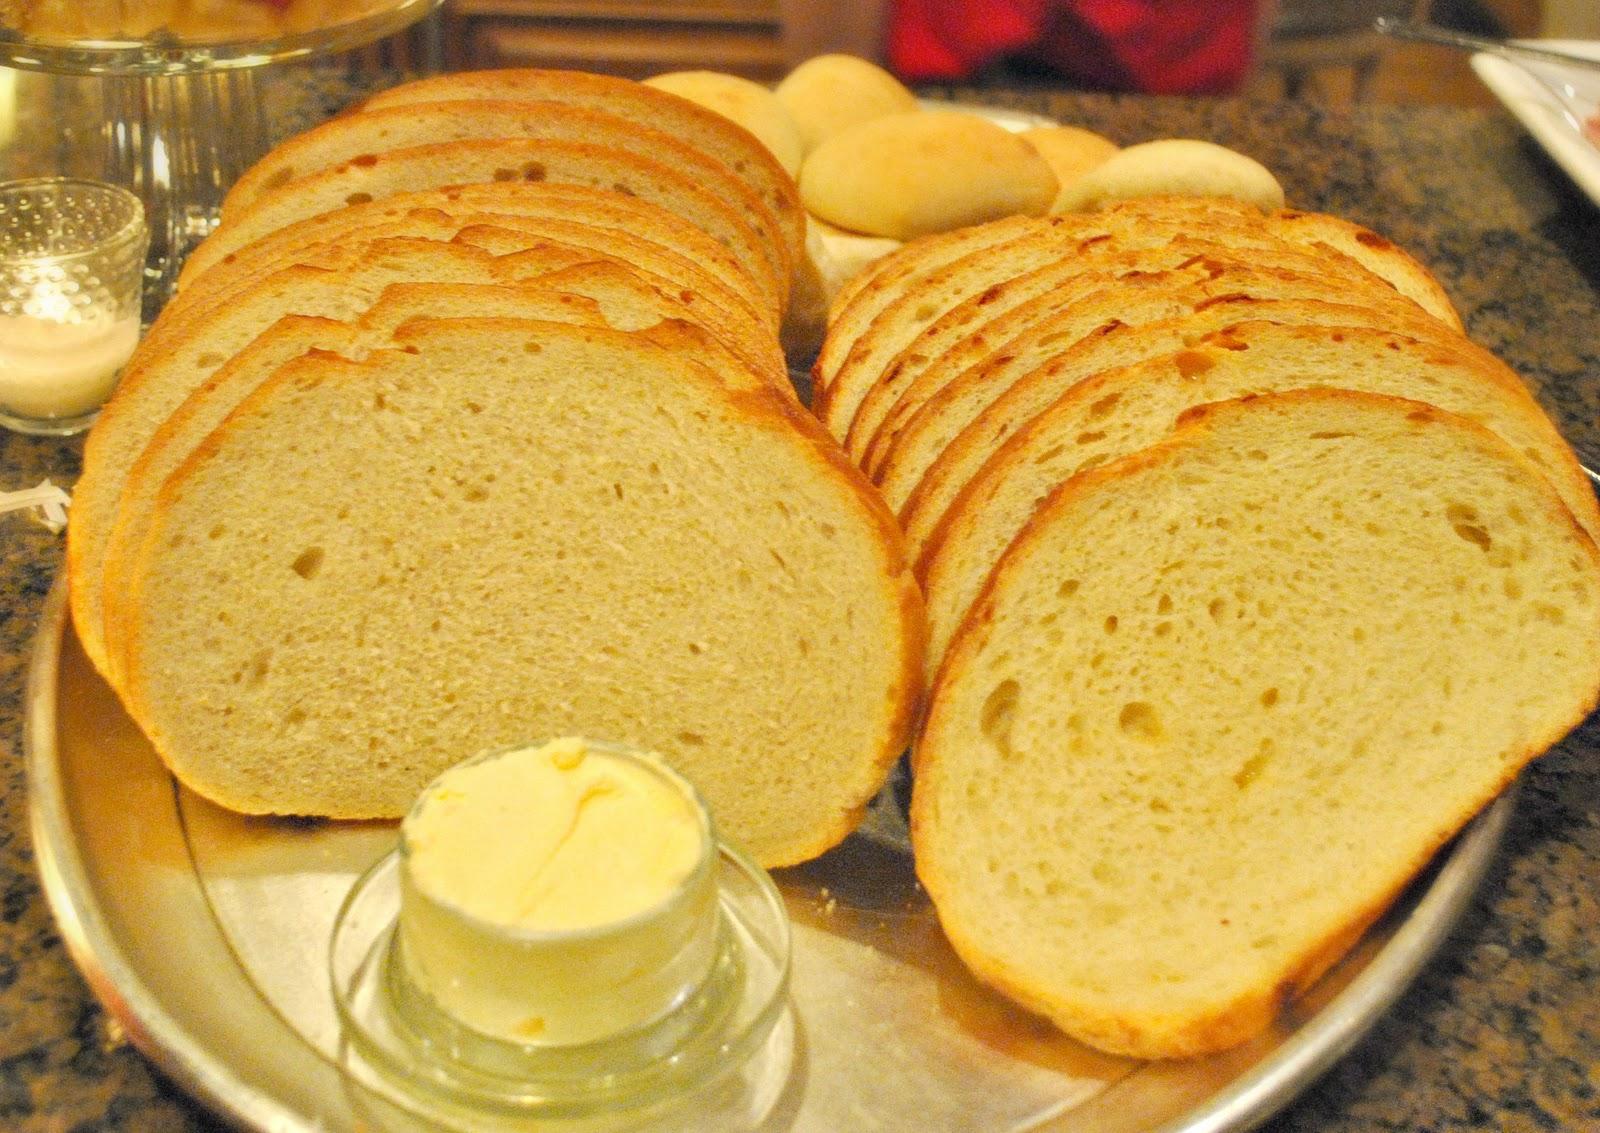 Panera Bread Restaurant Copycat Recipes: Three Cheese Bread